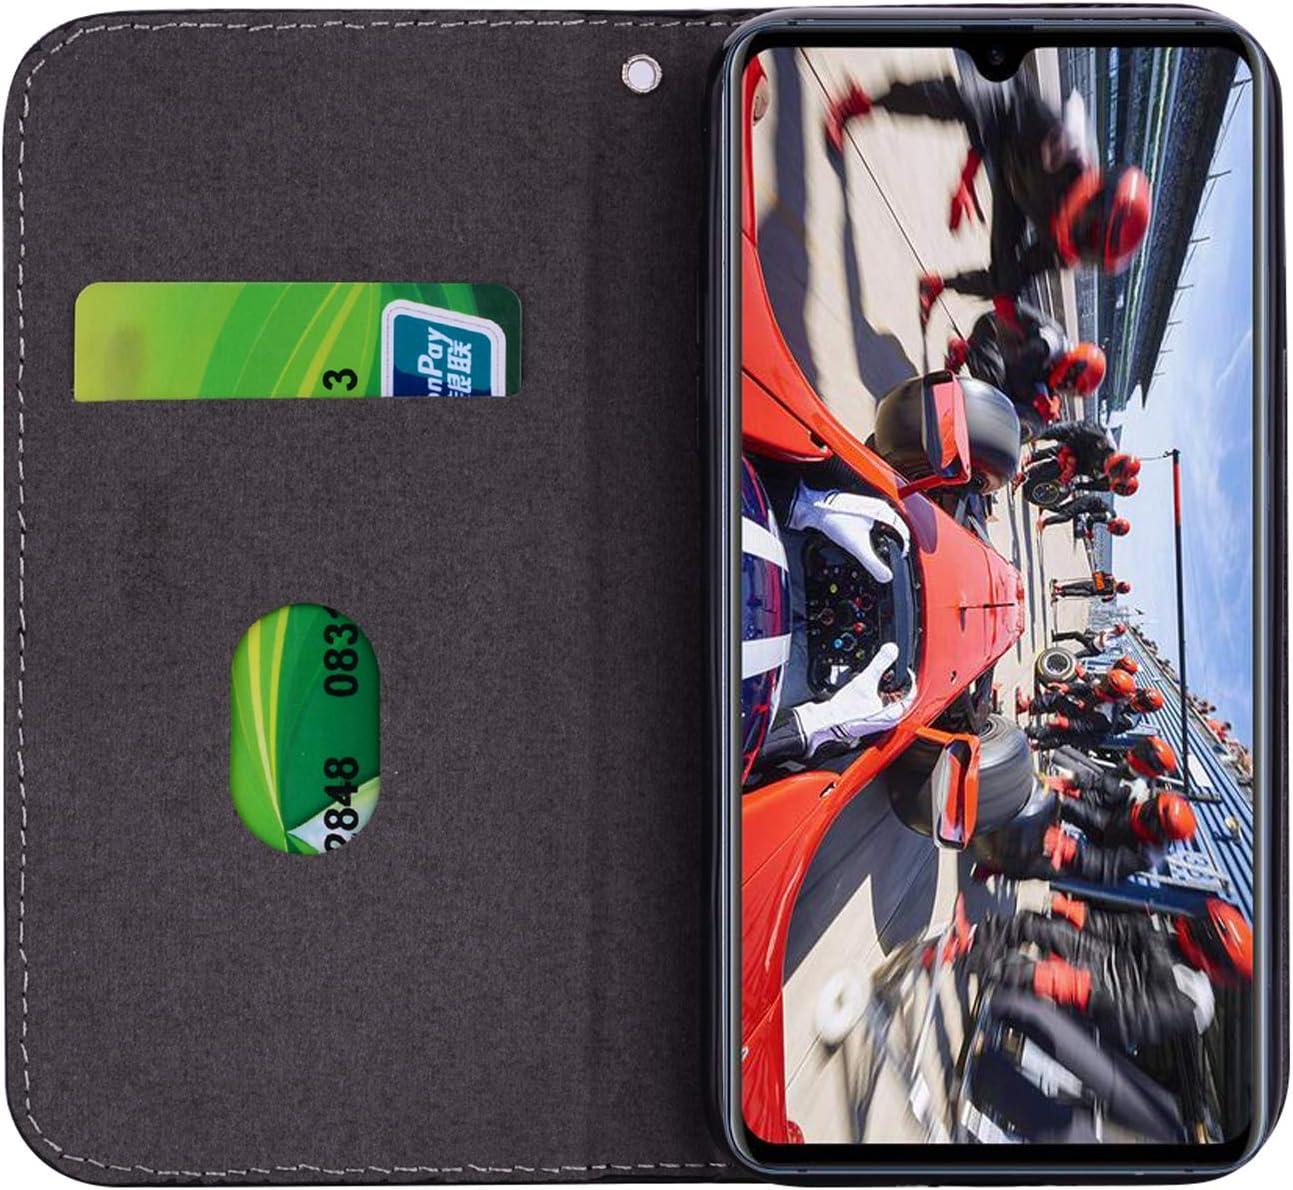 Karomenic PU Leder H/ülle kompatibel mit Huawei Mate 20 X Krokodilmuster Gl/änzend Glitzer Handyh/ülle Brieftasche Silikon Schutzh/ülle Klapph/ülle Magnet Ledertasche Flip Case Etui,Lila